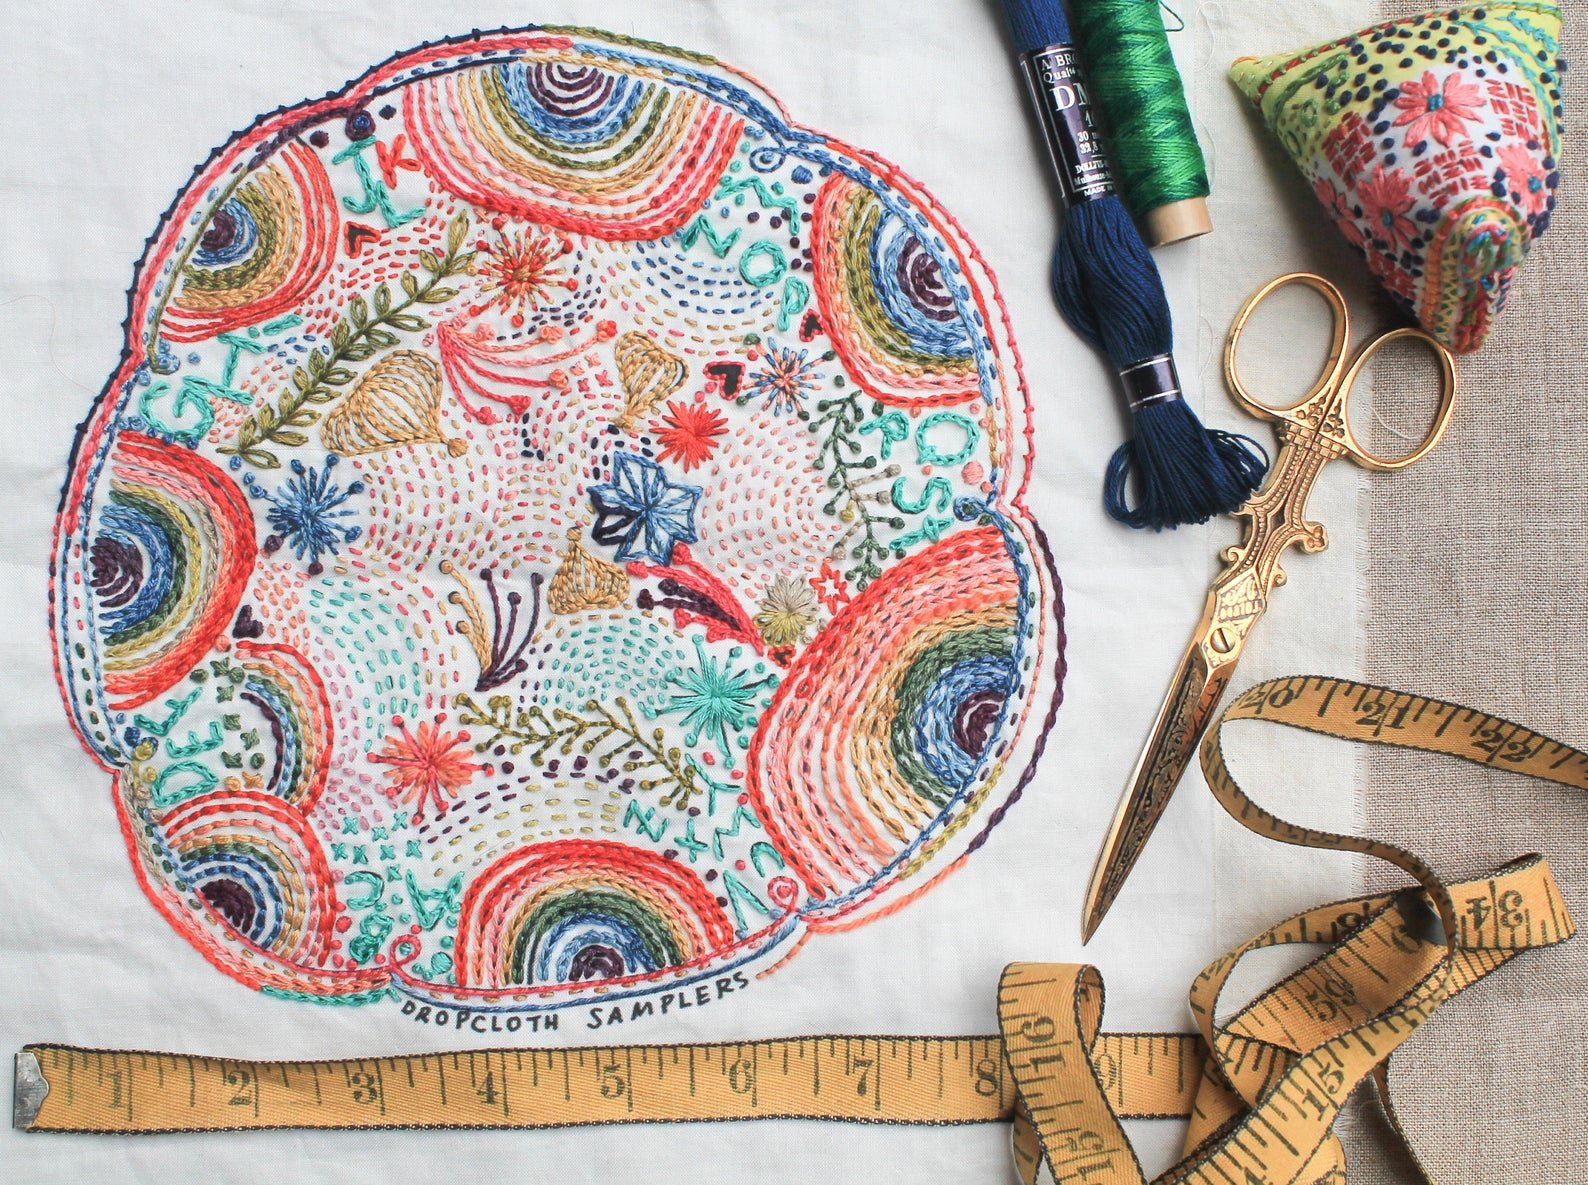 Disco Nap Embroidery Sampler - Dropcloth Samplers